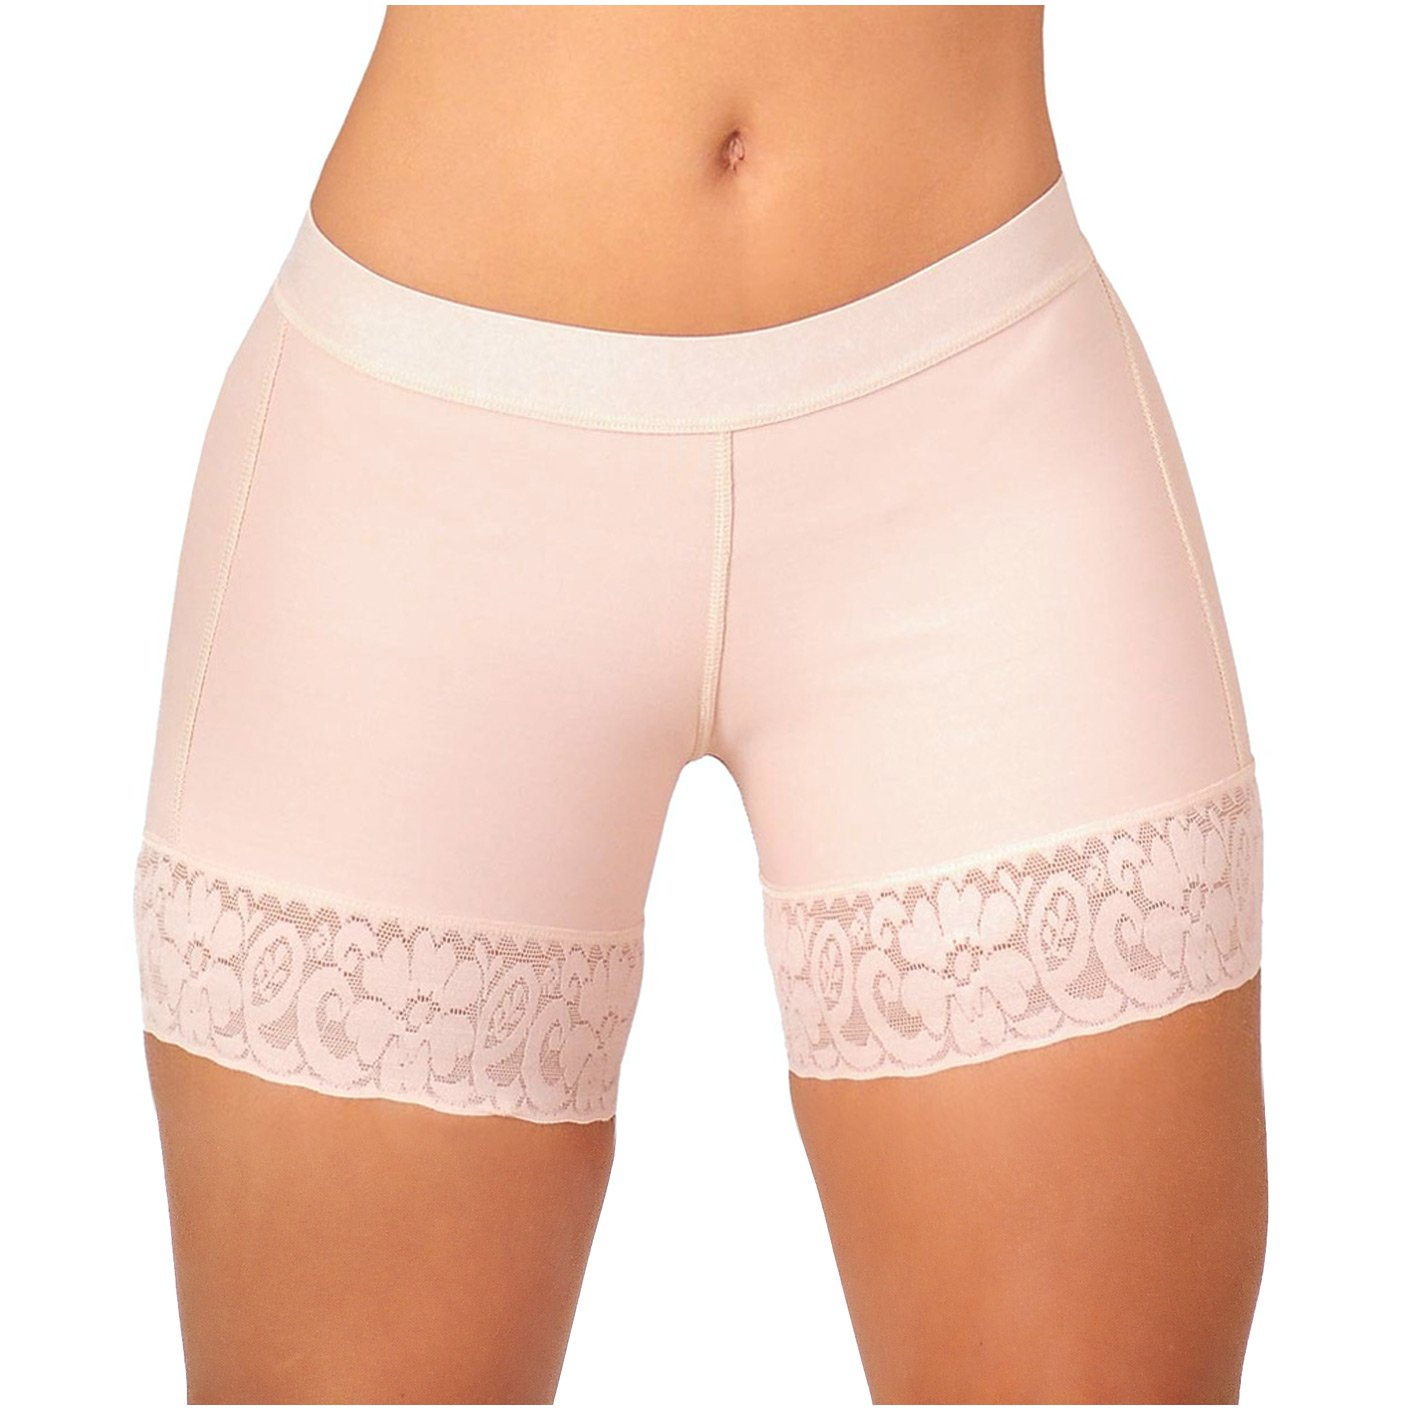 Fajas Salome 0321 Thigh Slim Enhancer Shapewear Butt Lift Shorts Levanta Cola